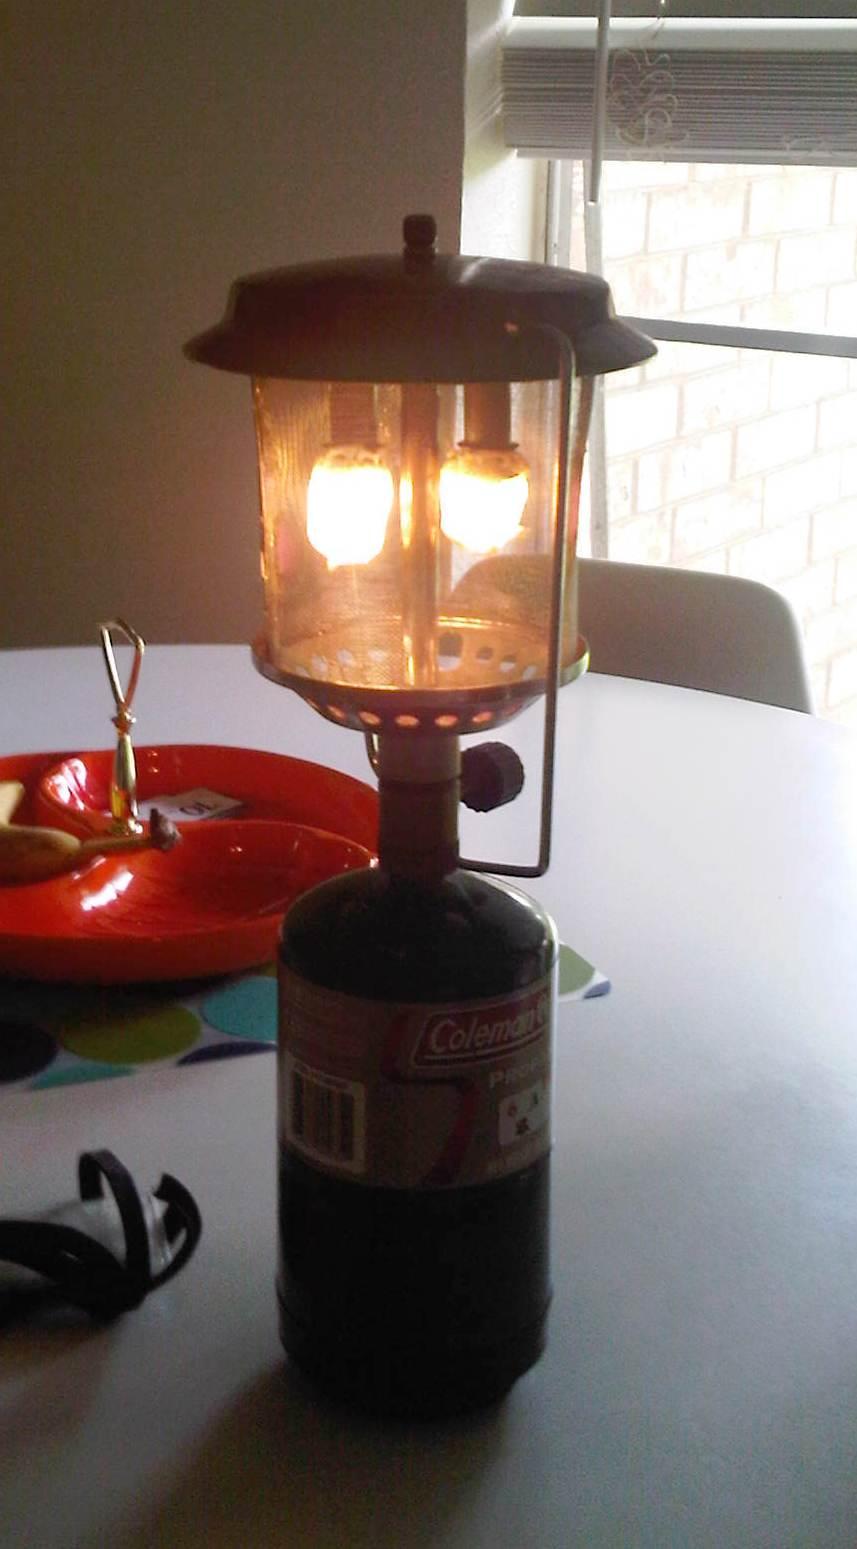 $2 Indestructible Wire Mesh Globe for Propane Lantern: 7 Steps